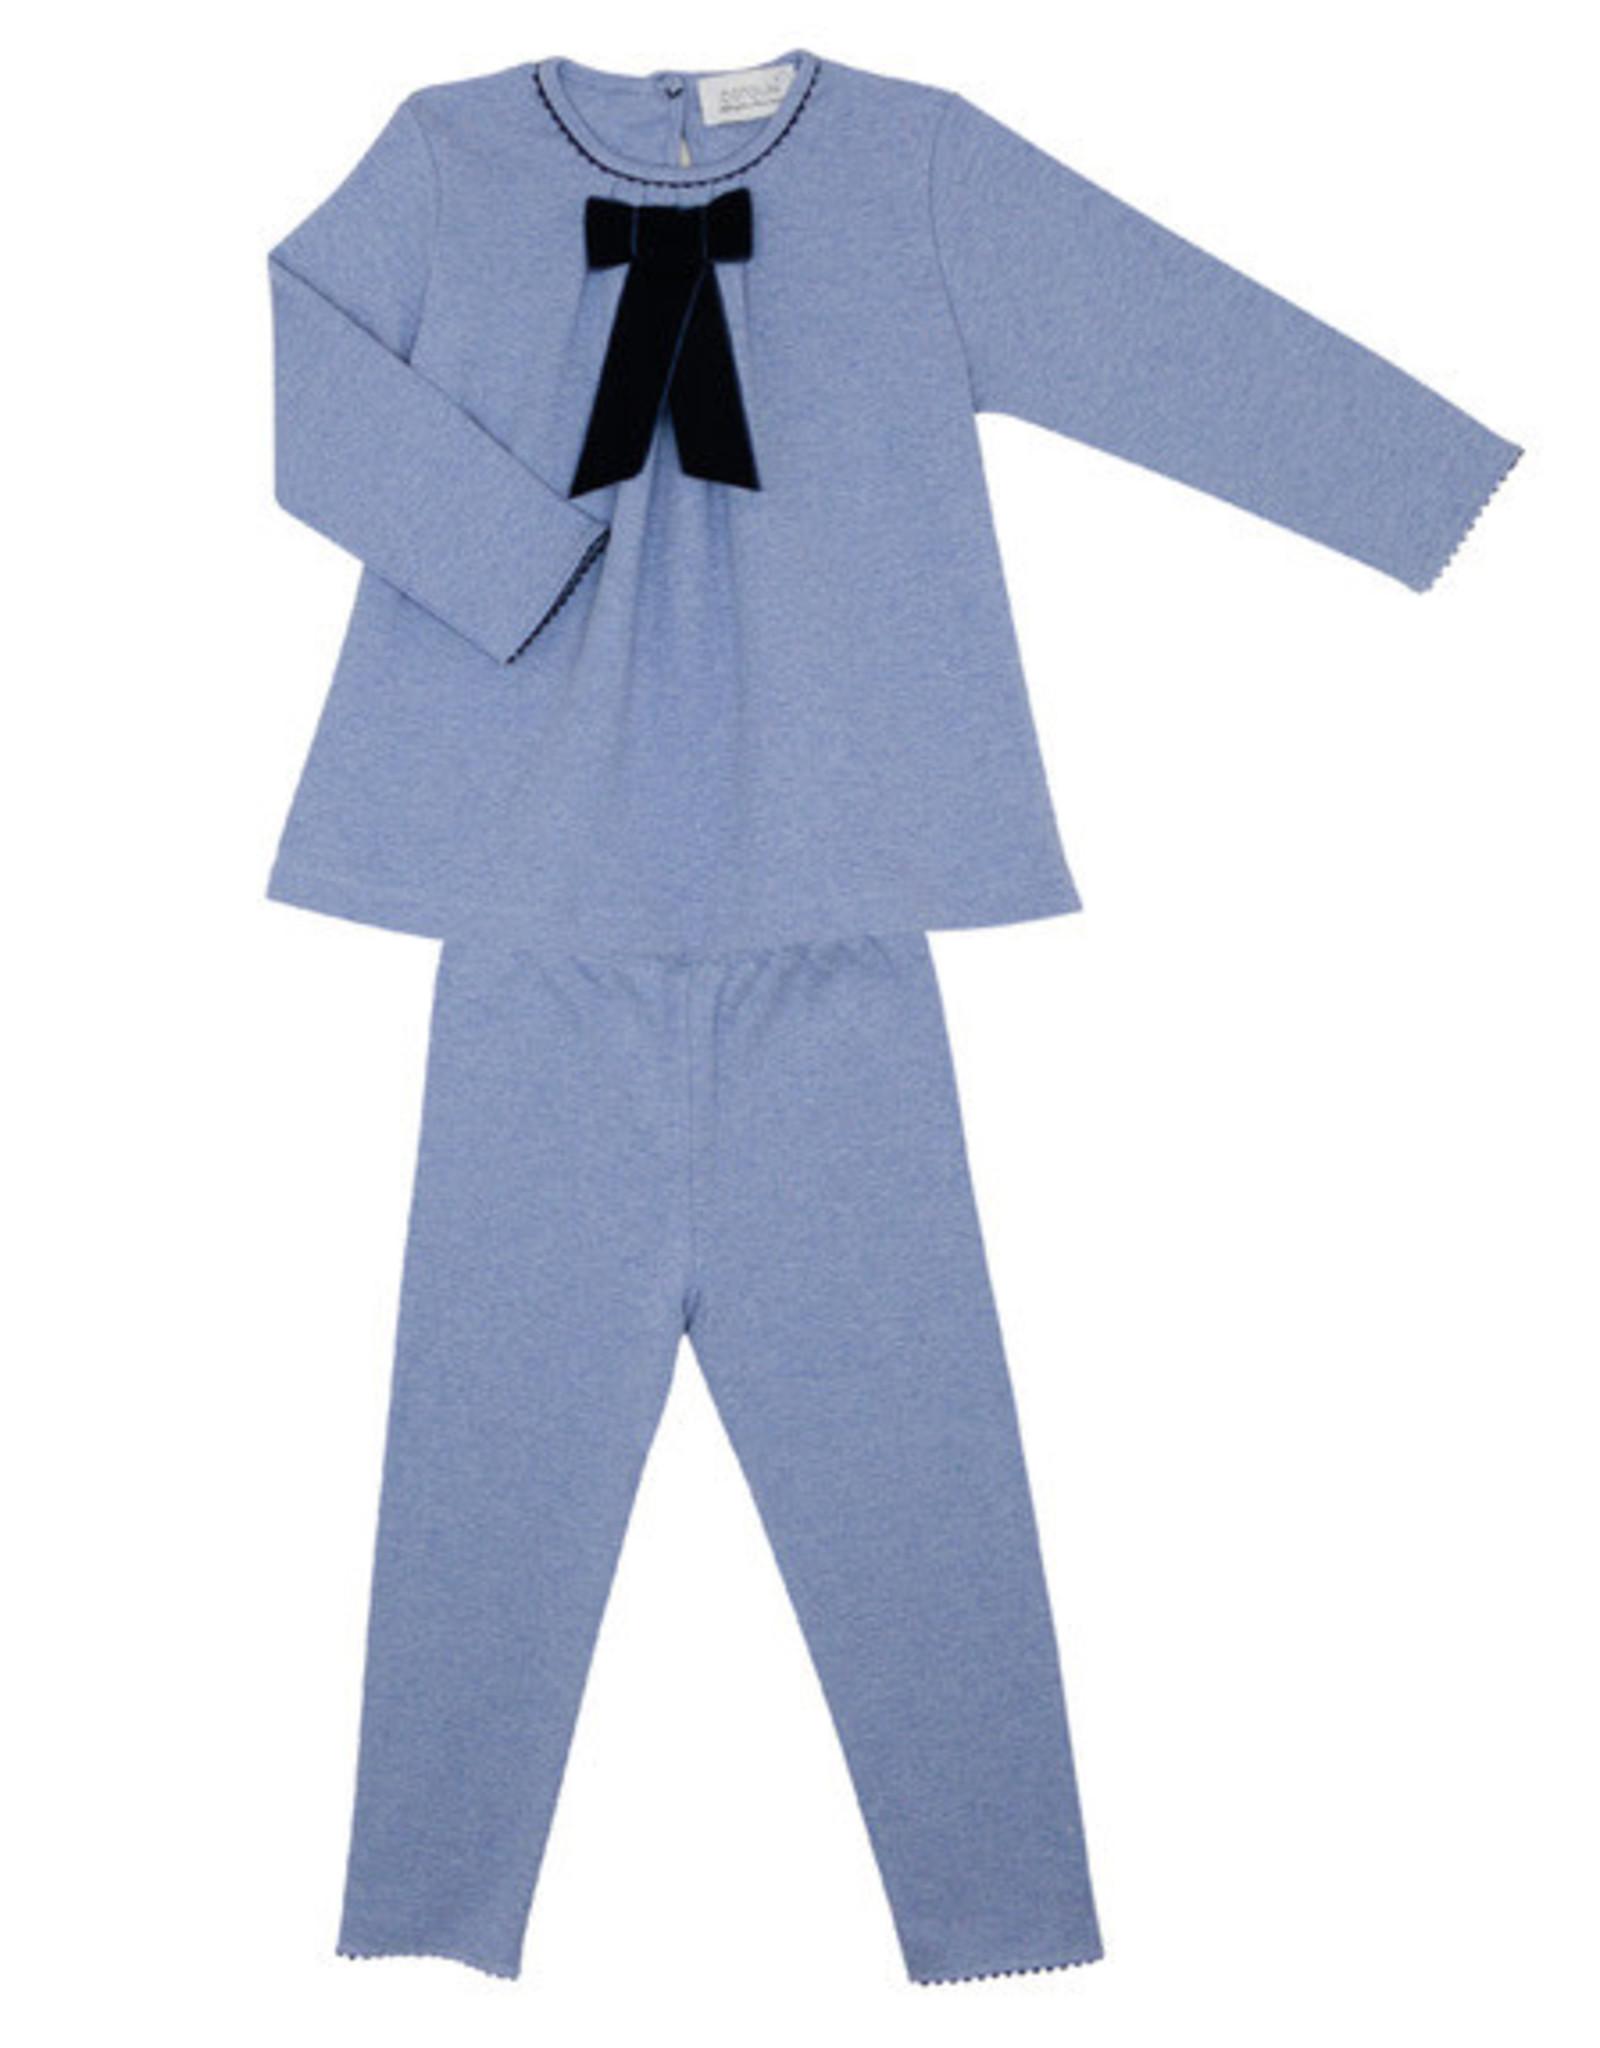 COTOLINI Pyjama Odette ciel chiné